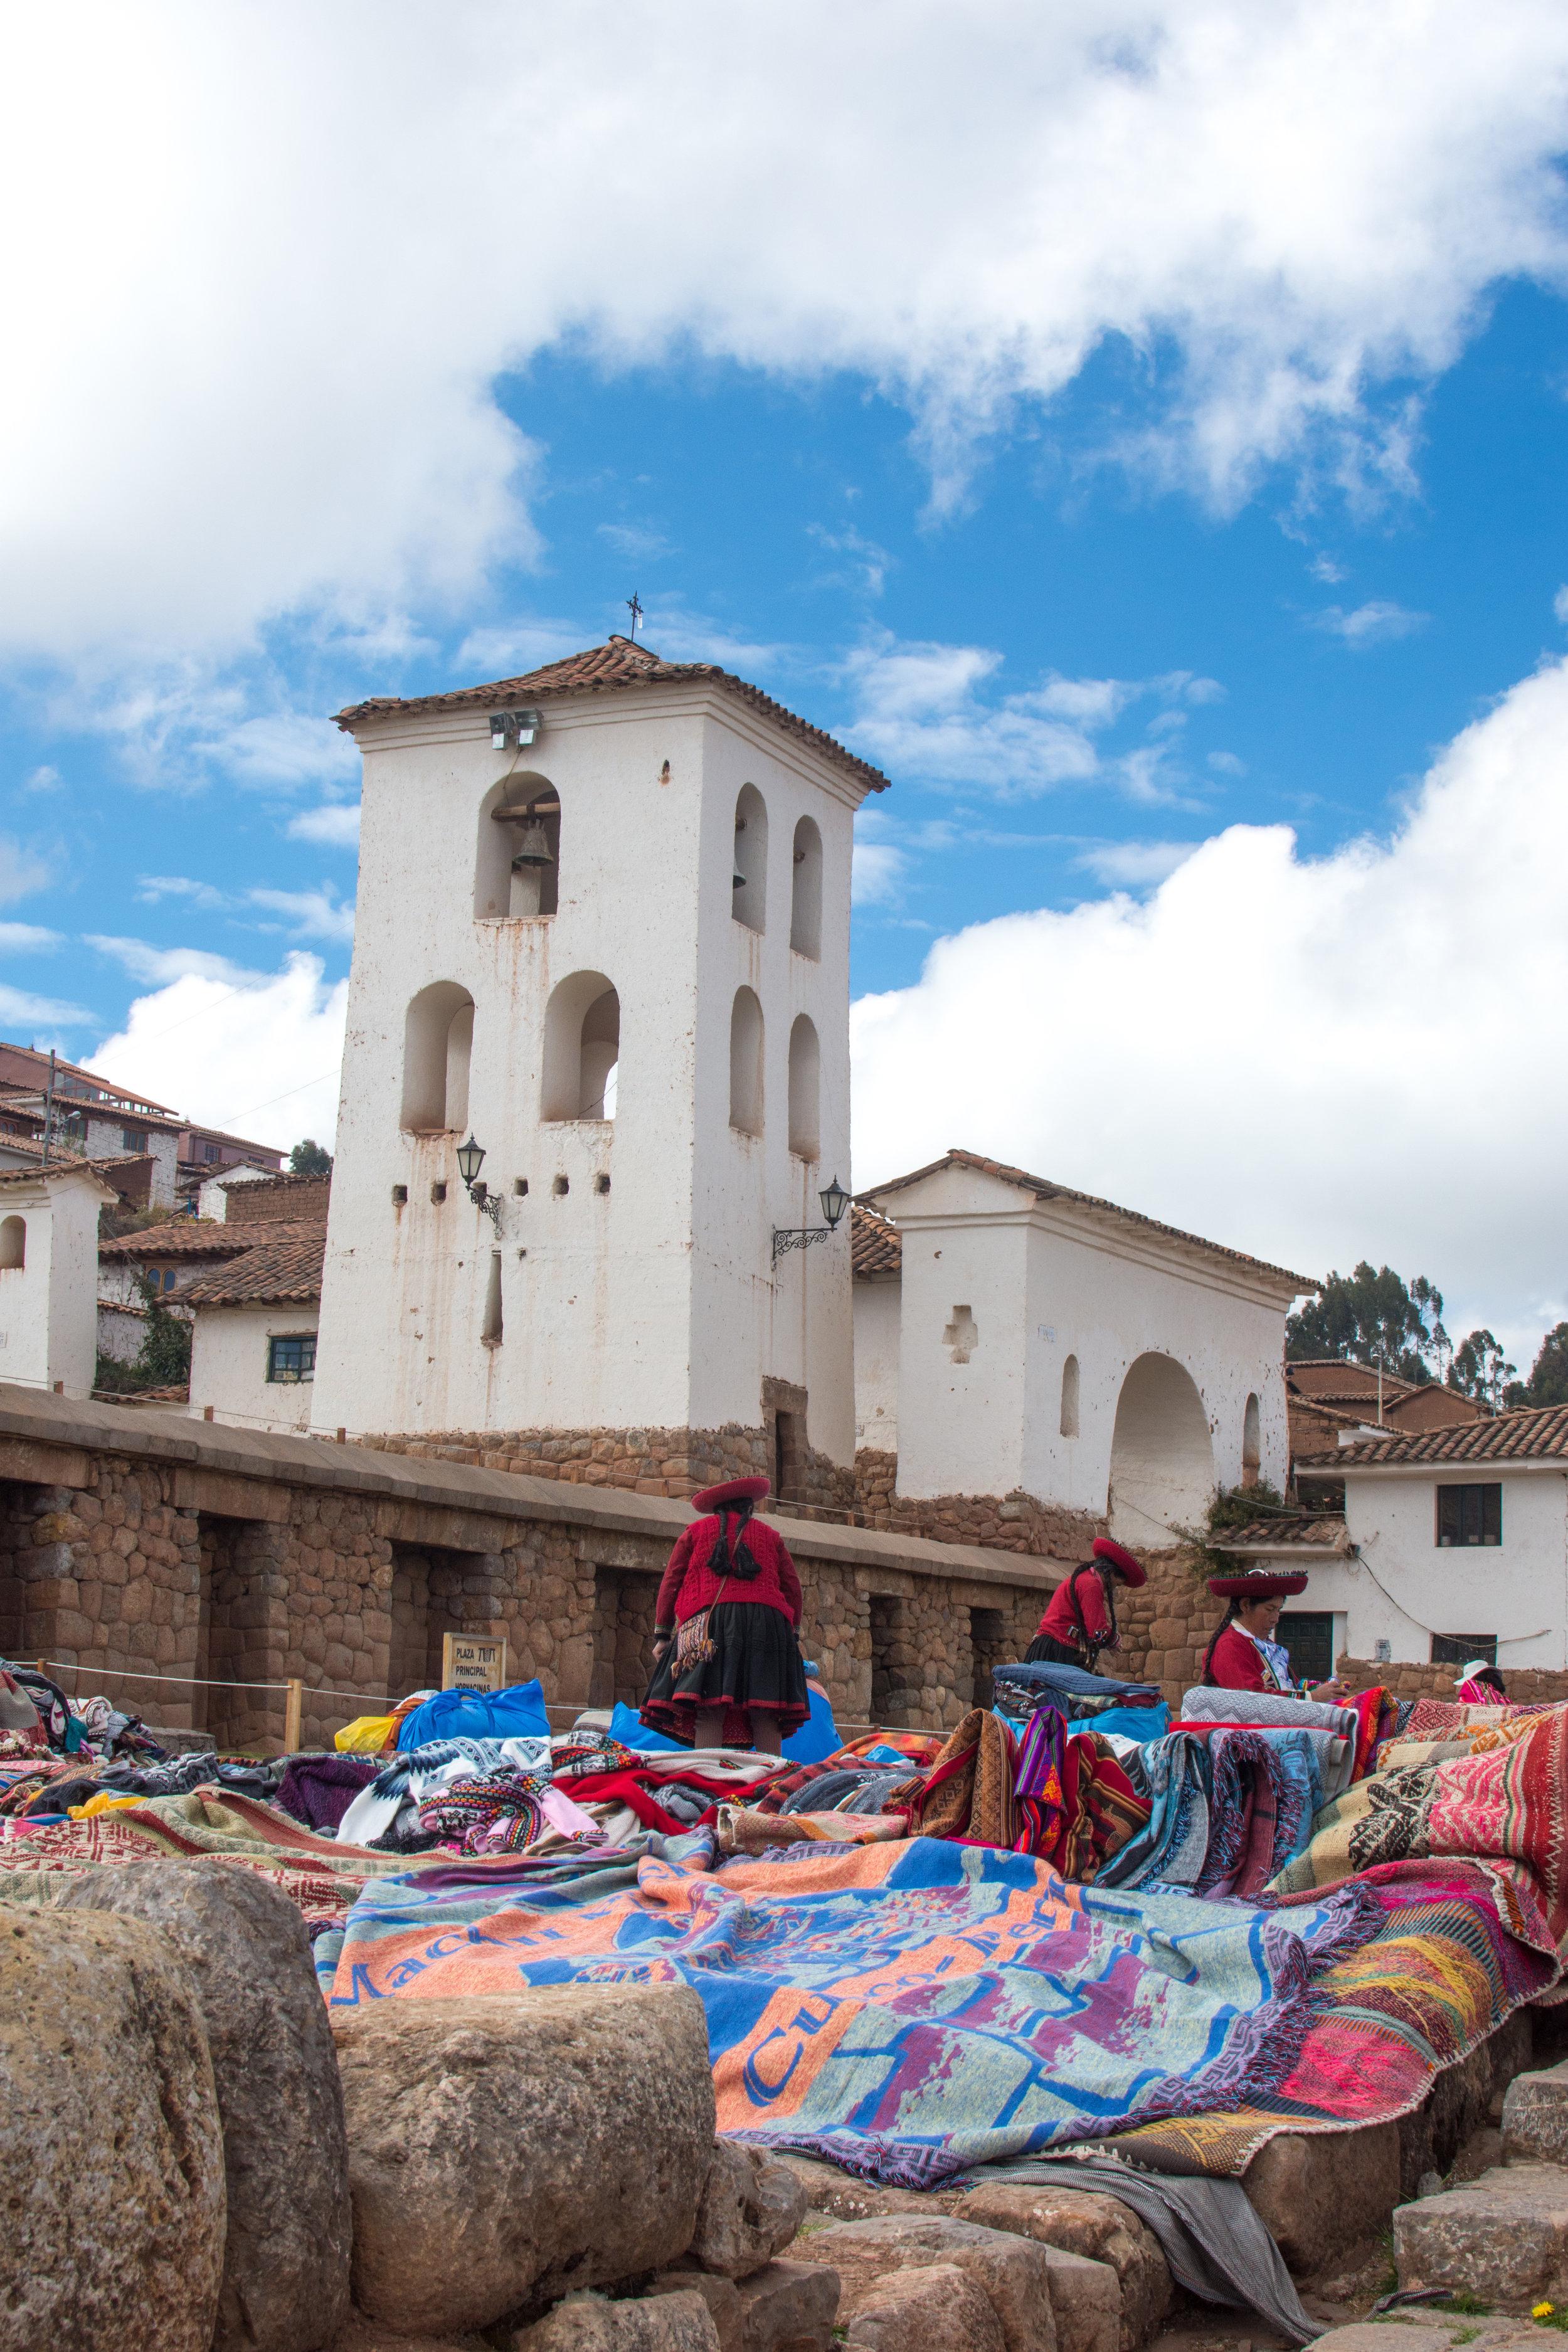 Textile Market at Chinchero